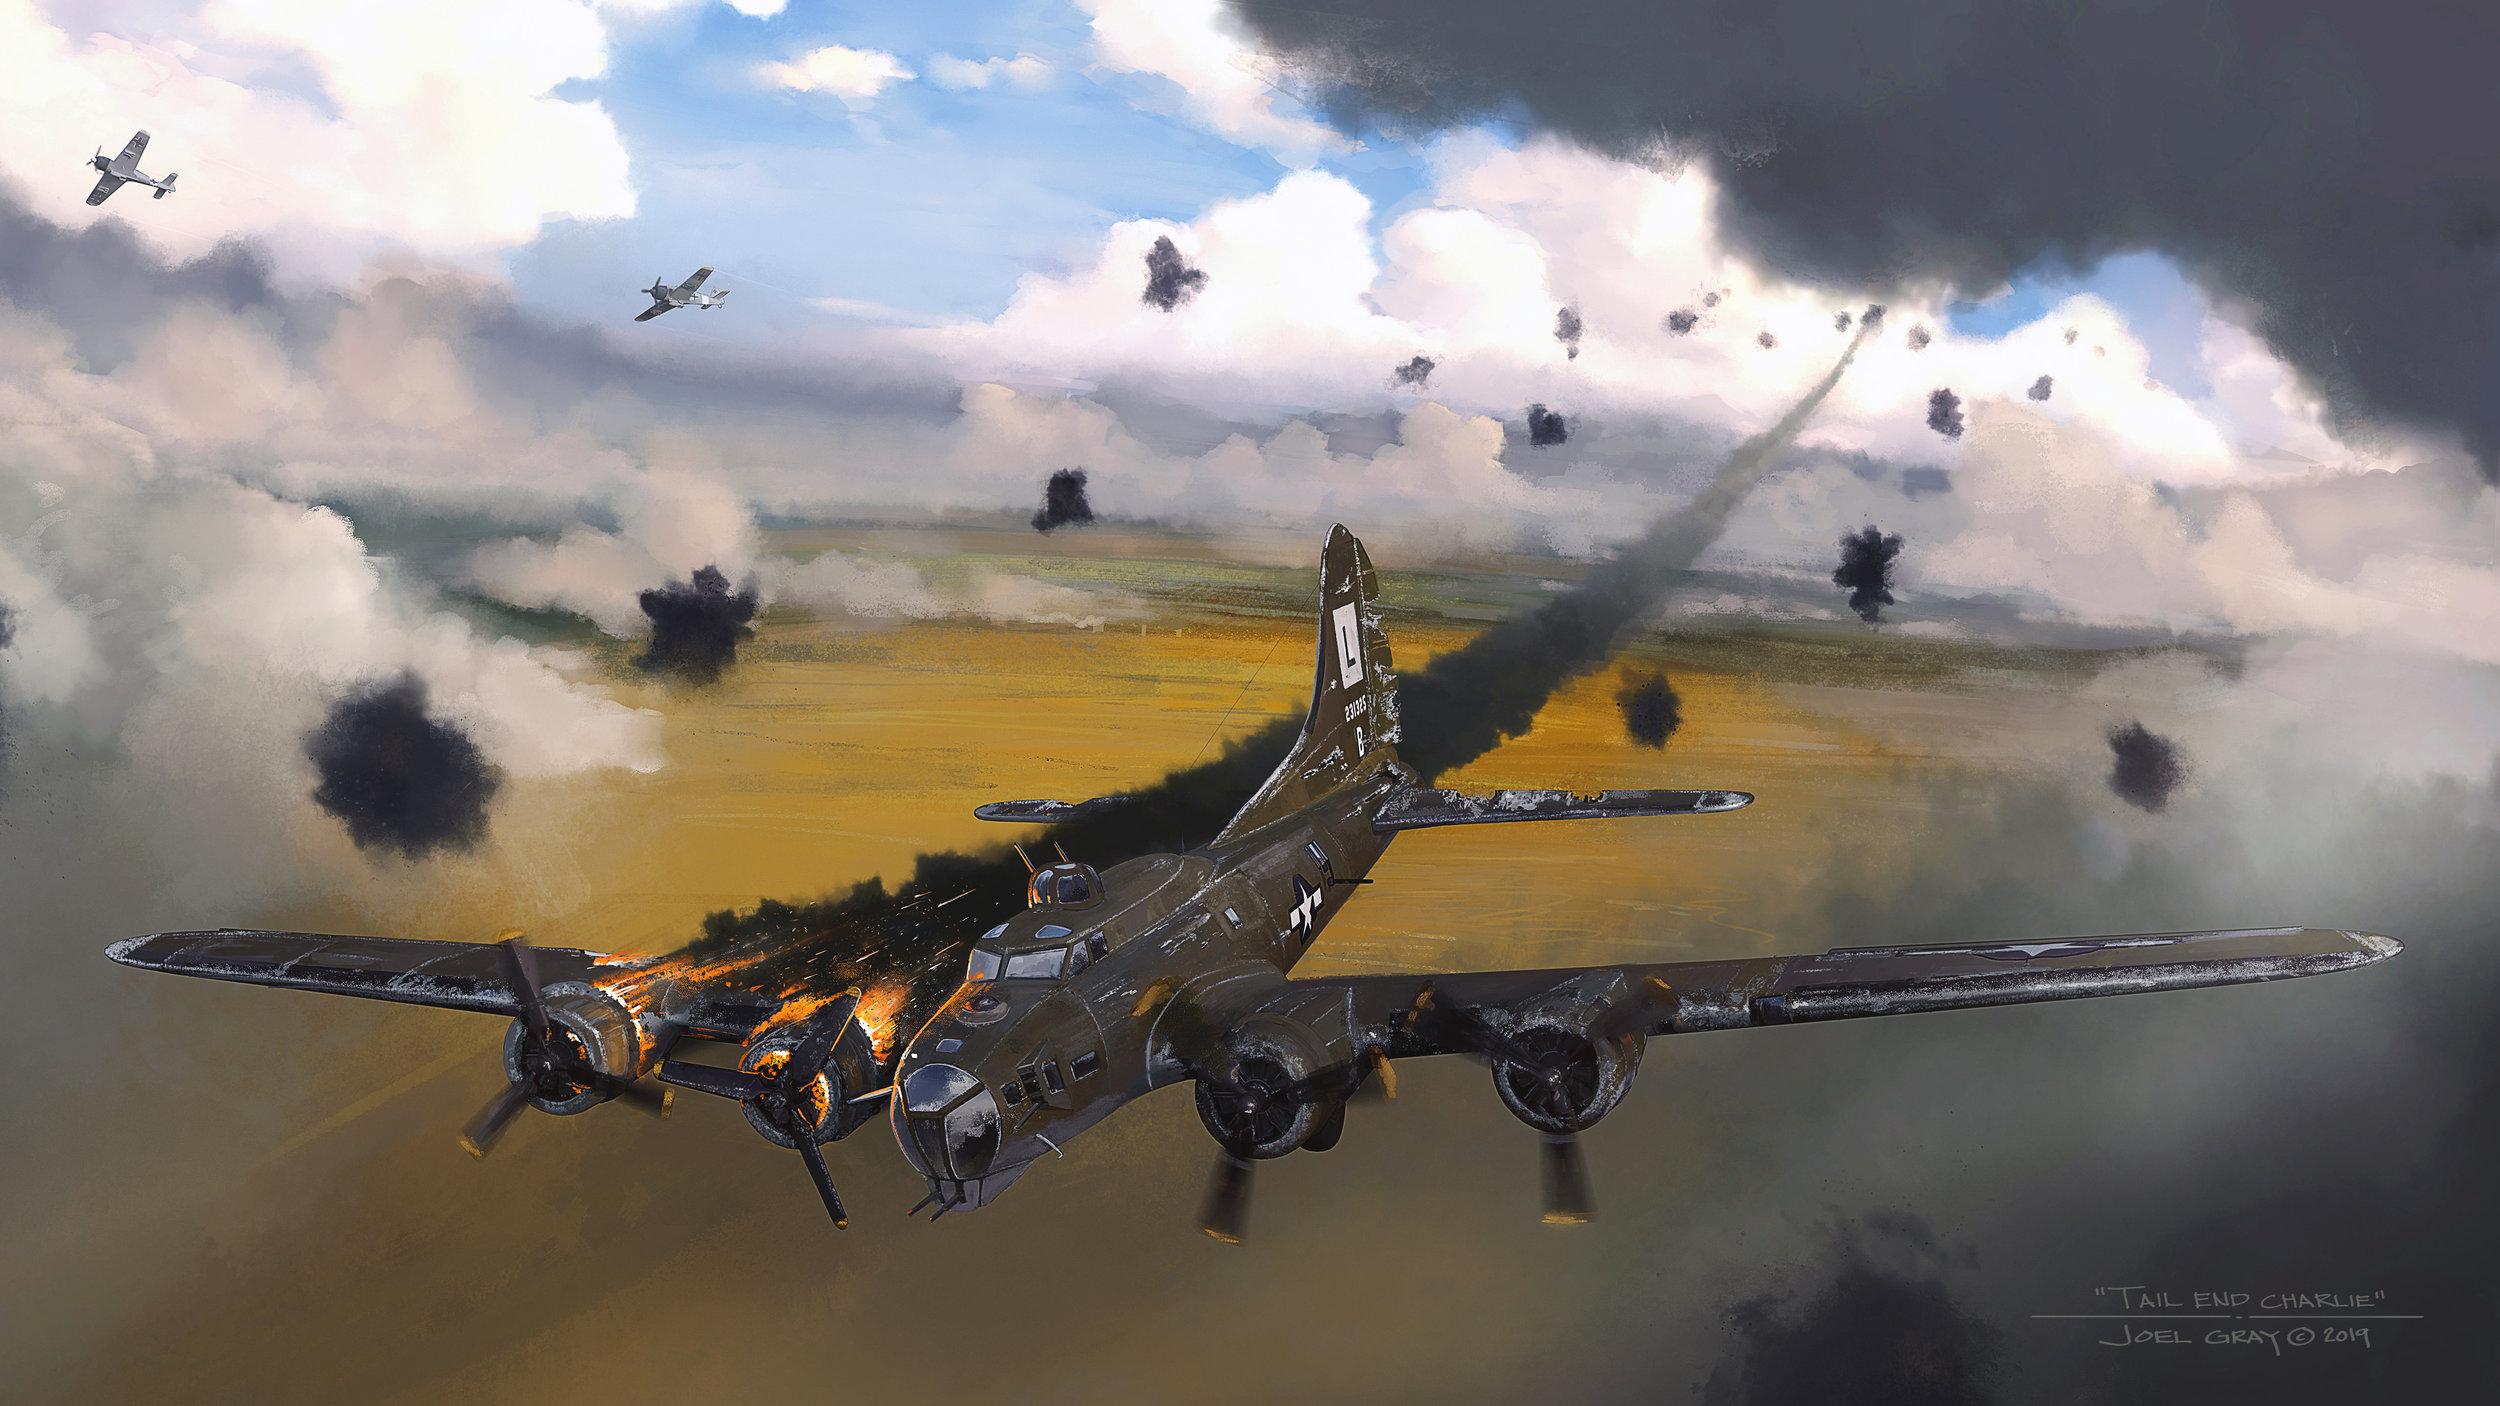 Tail End Charlie, B-17G, 42-31325